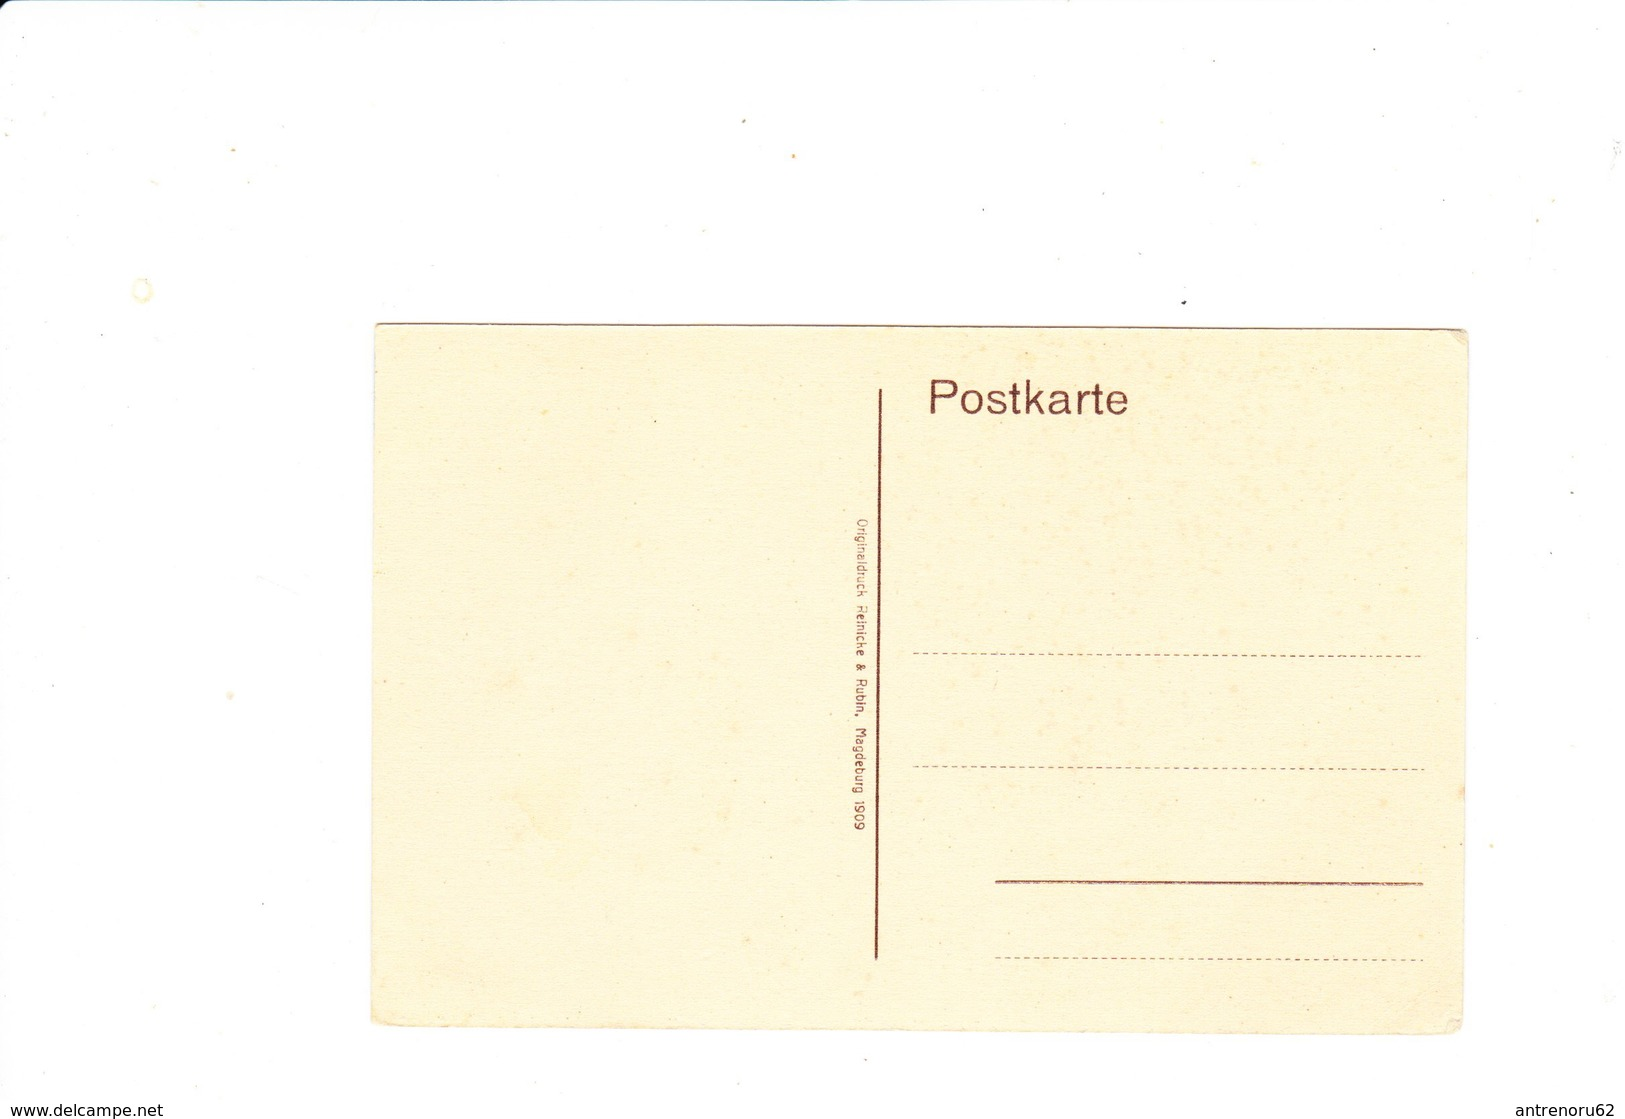 POSTCARD-GERMANY-HALLE-SEE-SCAN - Halle (Saale)